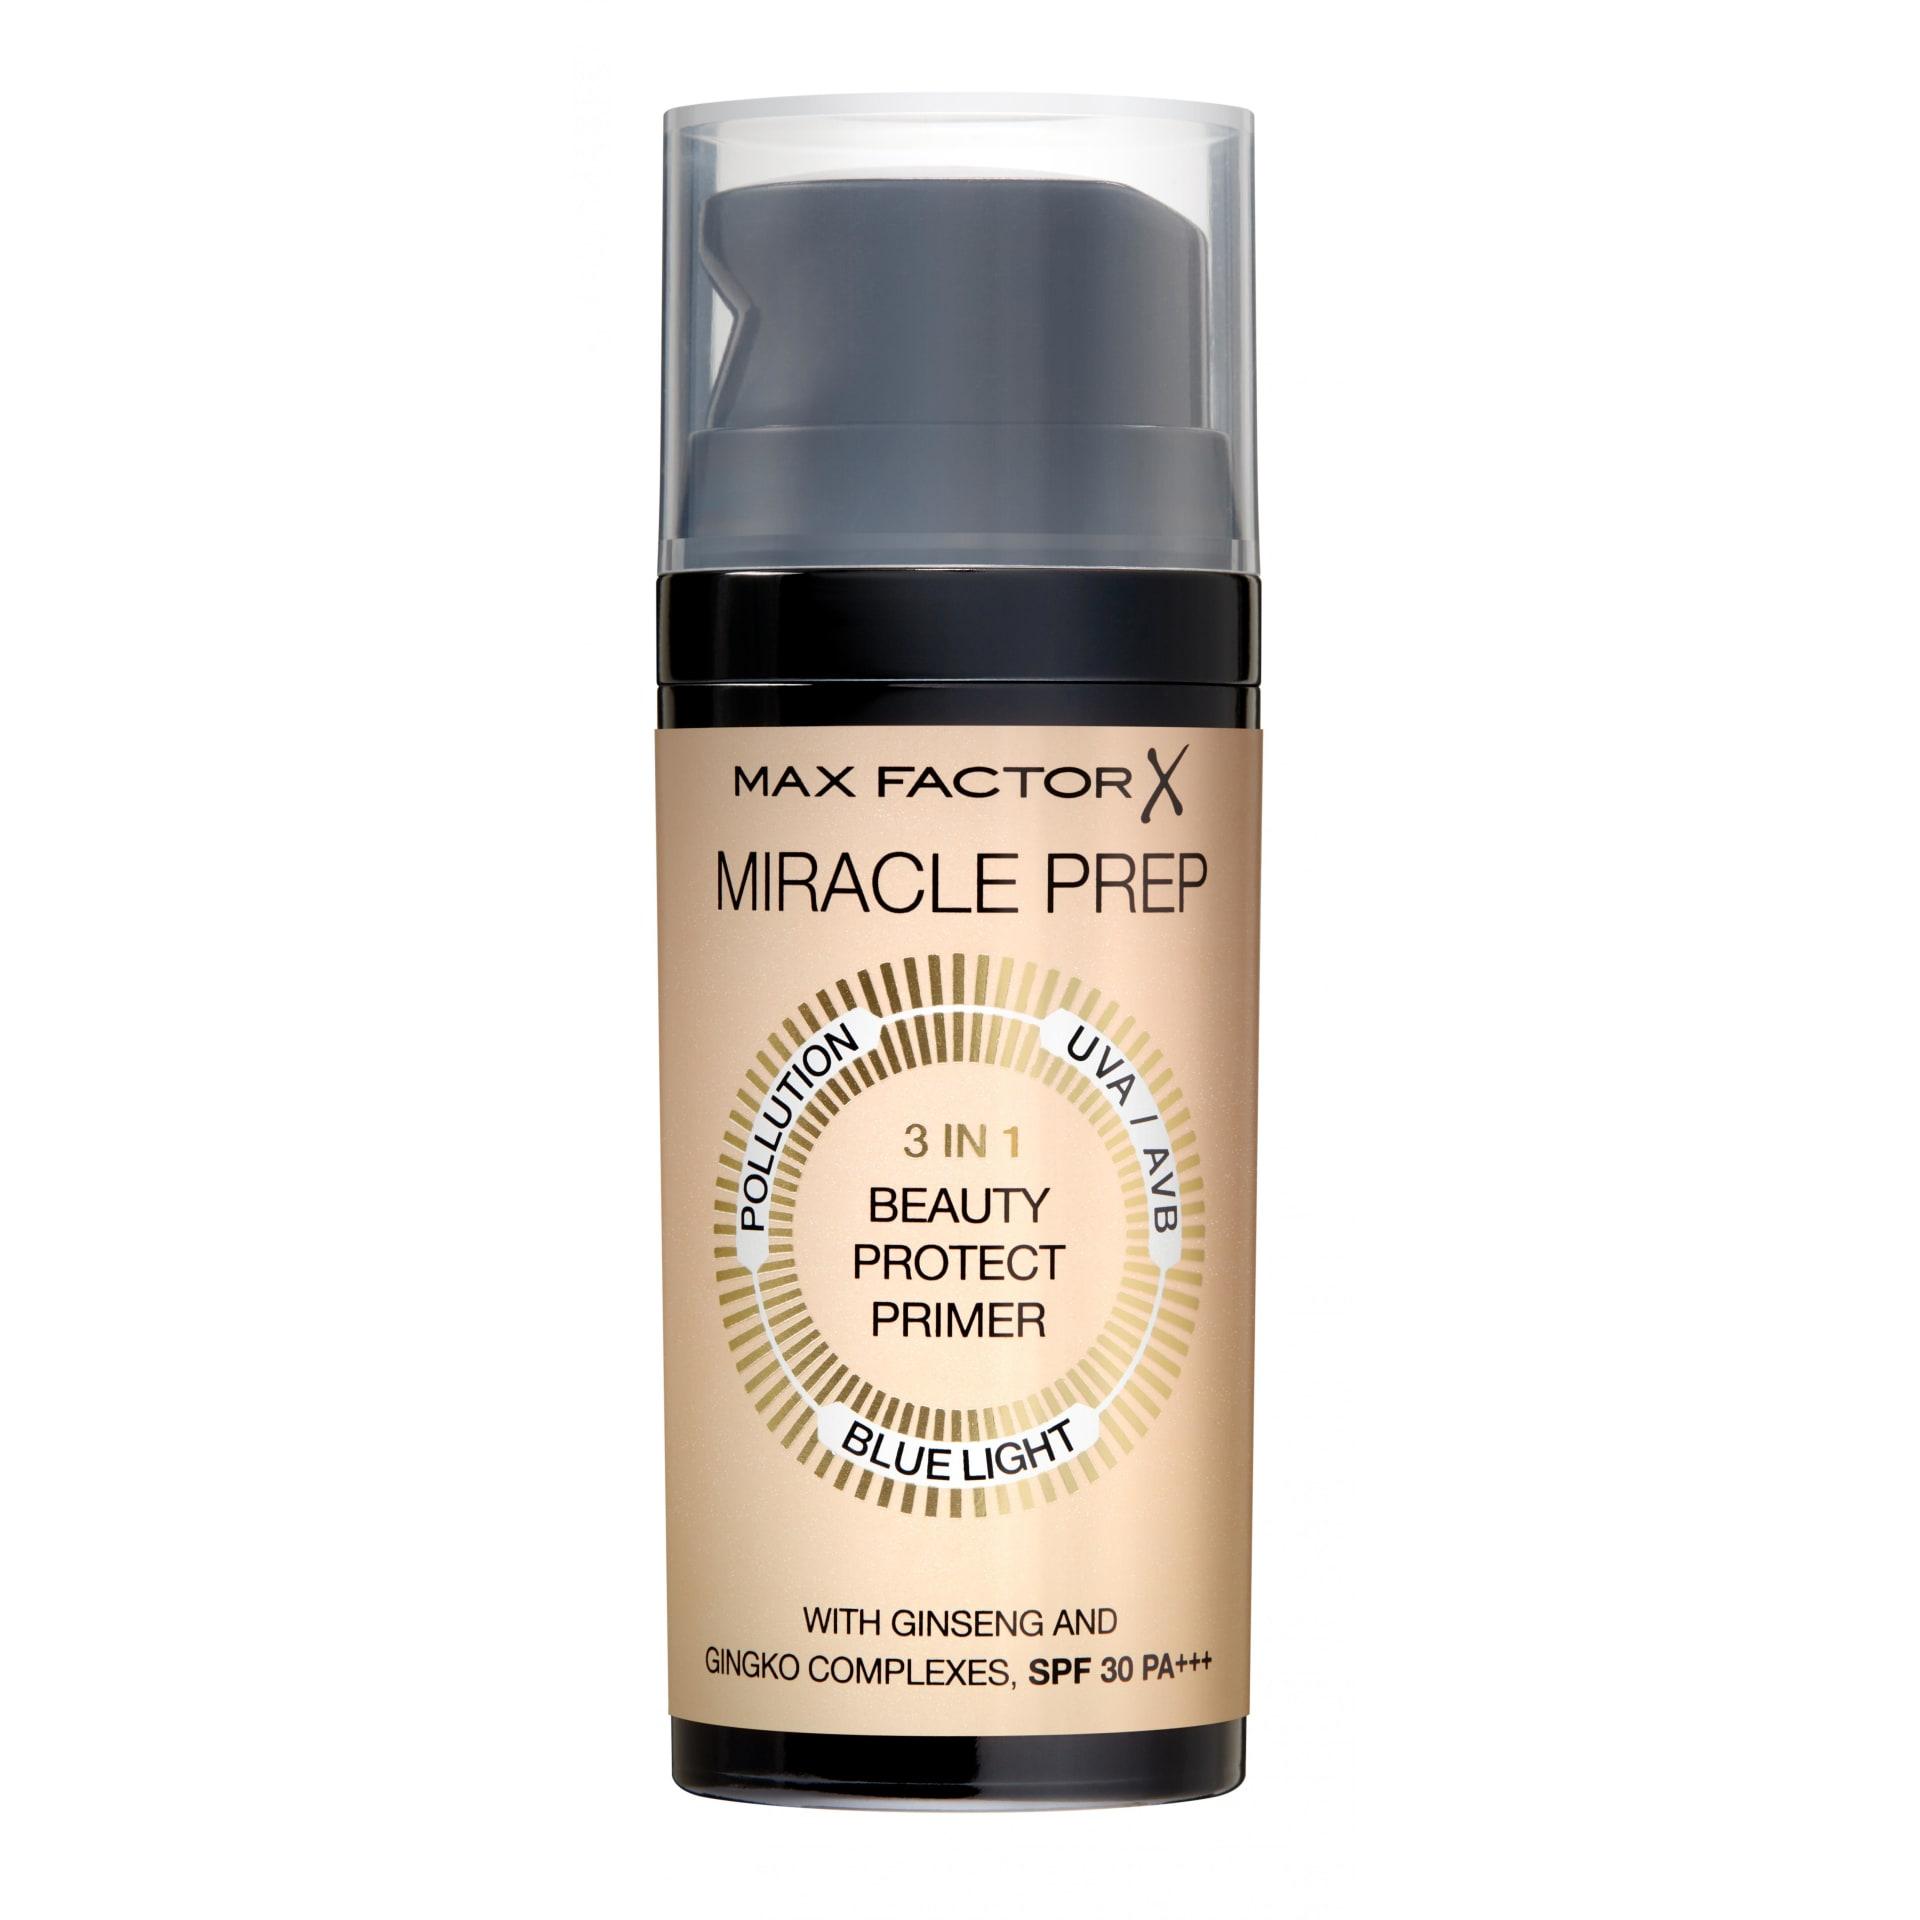 Miracle Prep Beauty Protect Primer SPF30 PA